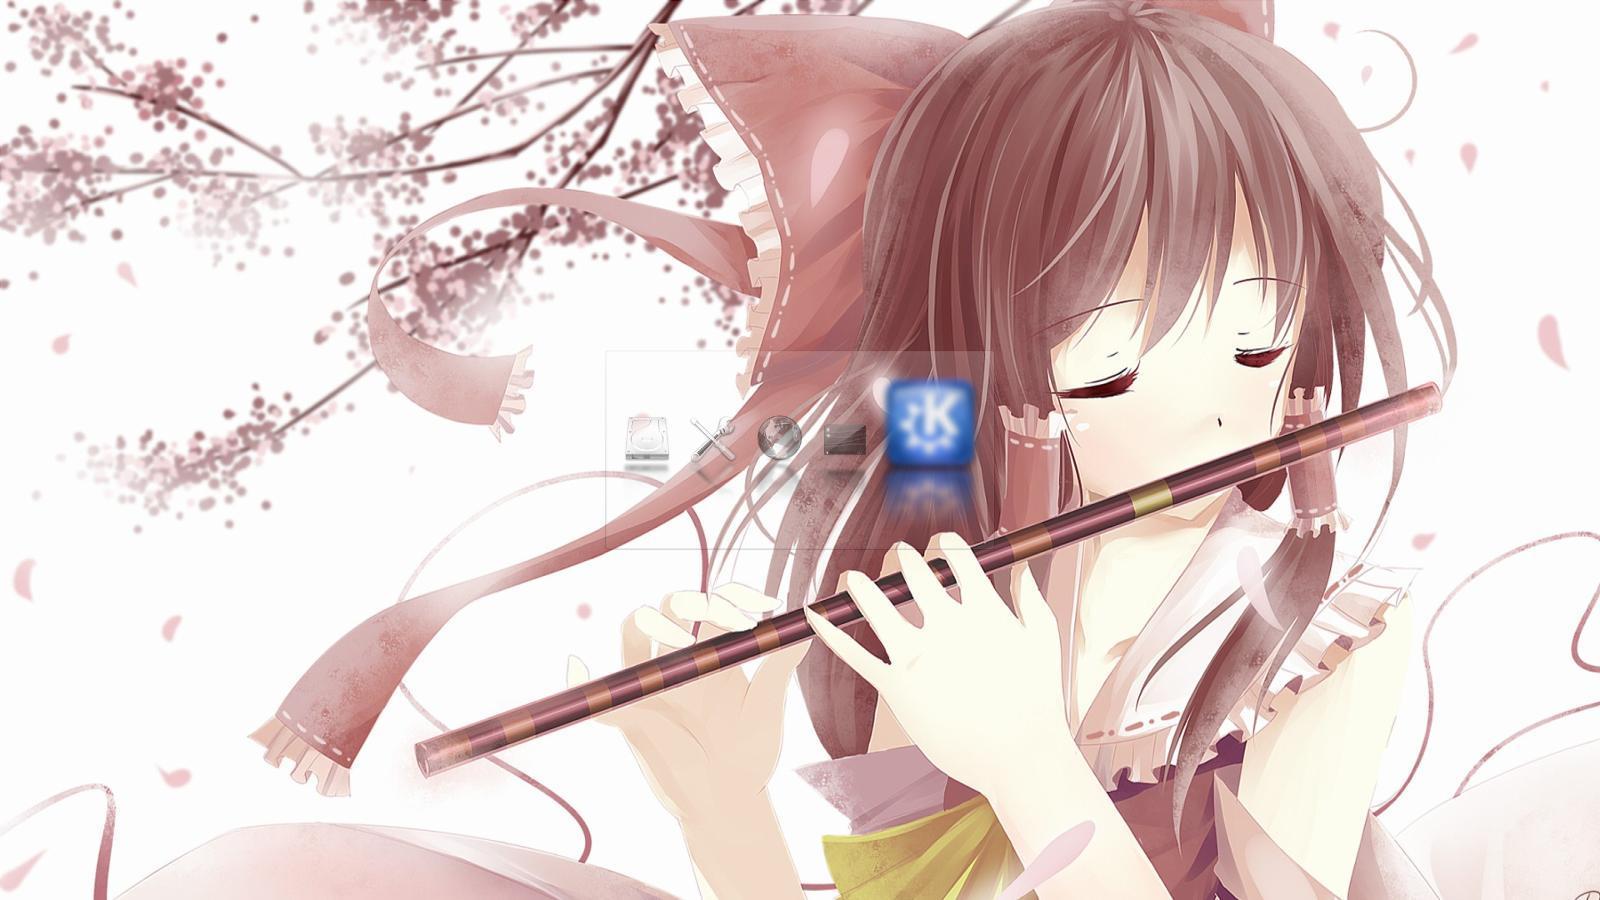 KSplash - Hakurei Reimu